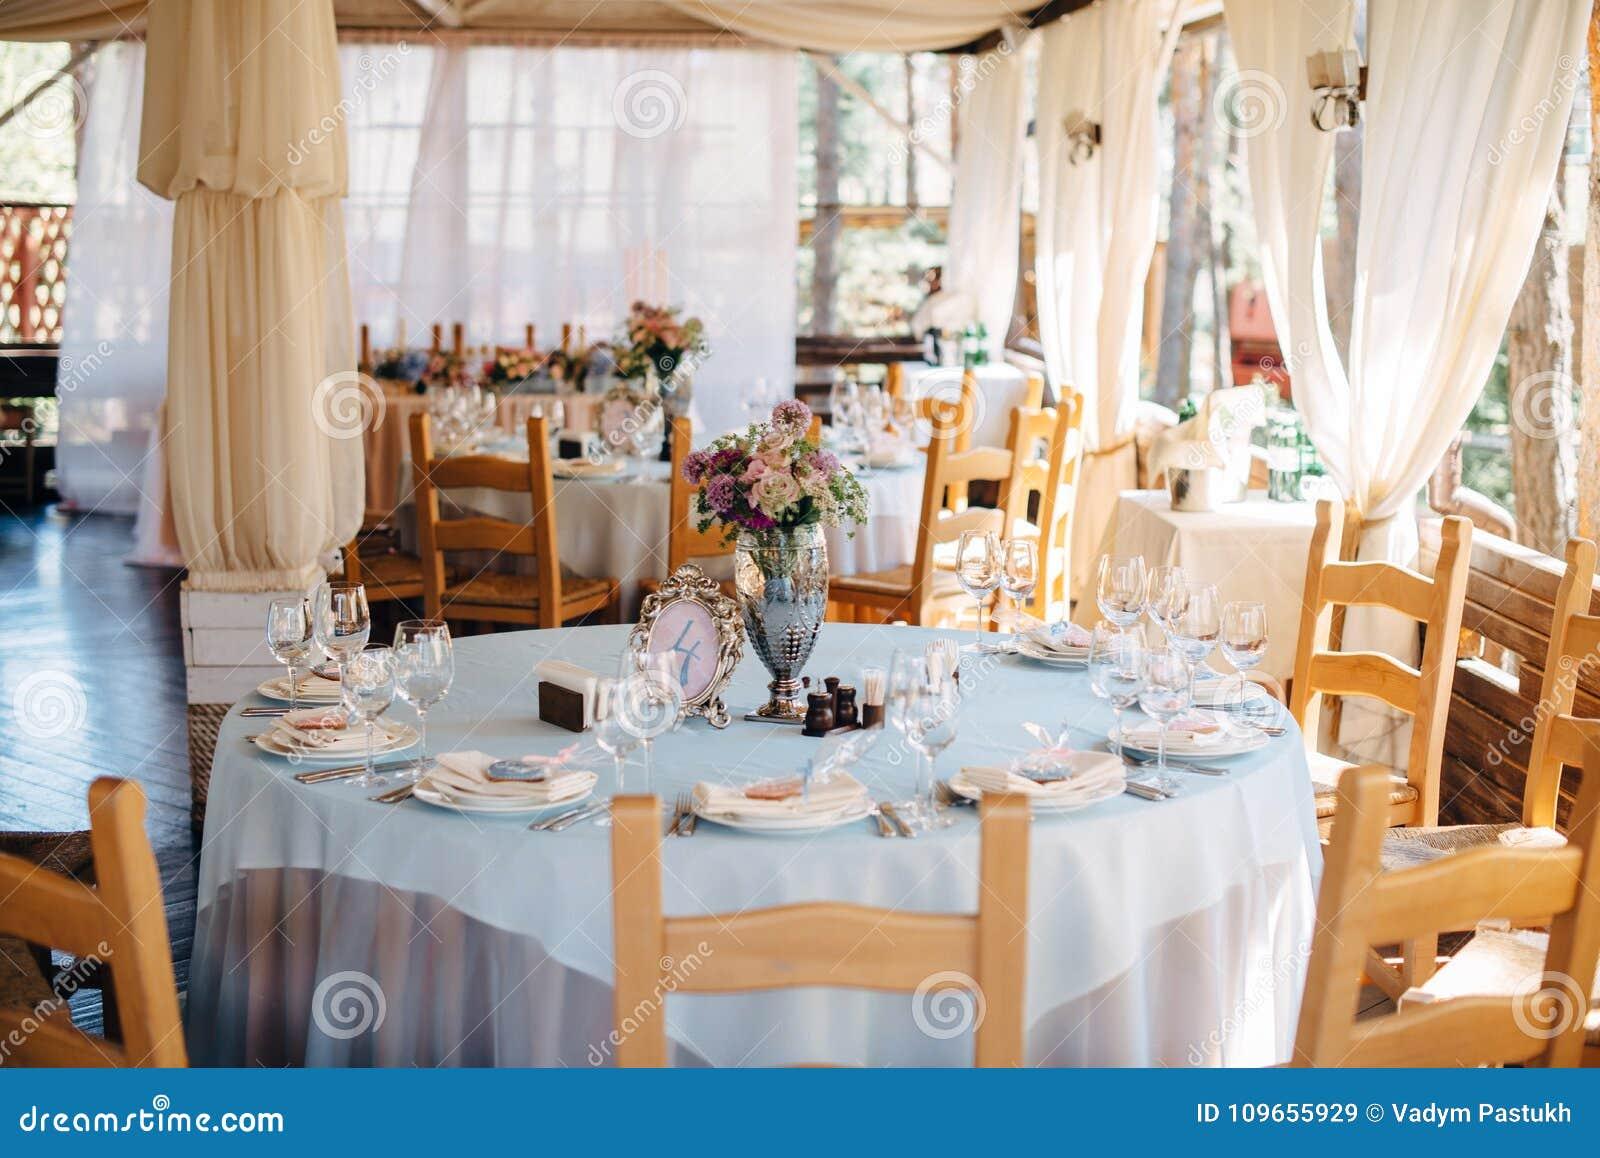 Terrific Wedding Decorated Tables In Restaurant Stock Image Image Interior Design Ideas Clesiryabchikinfo